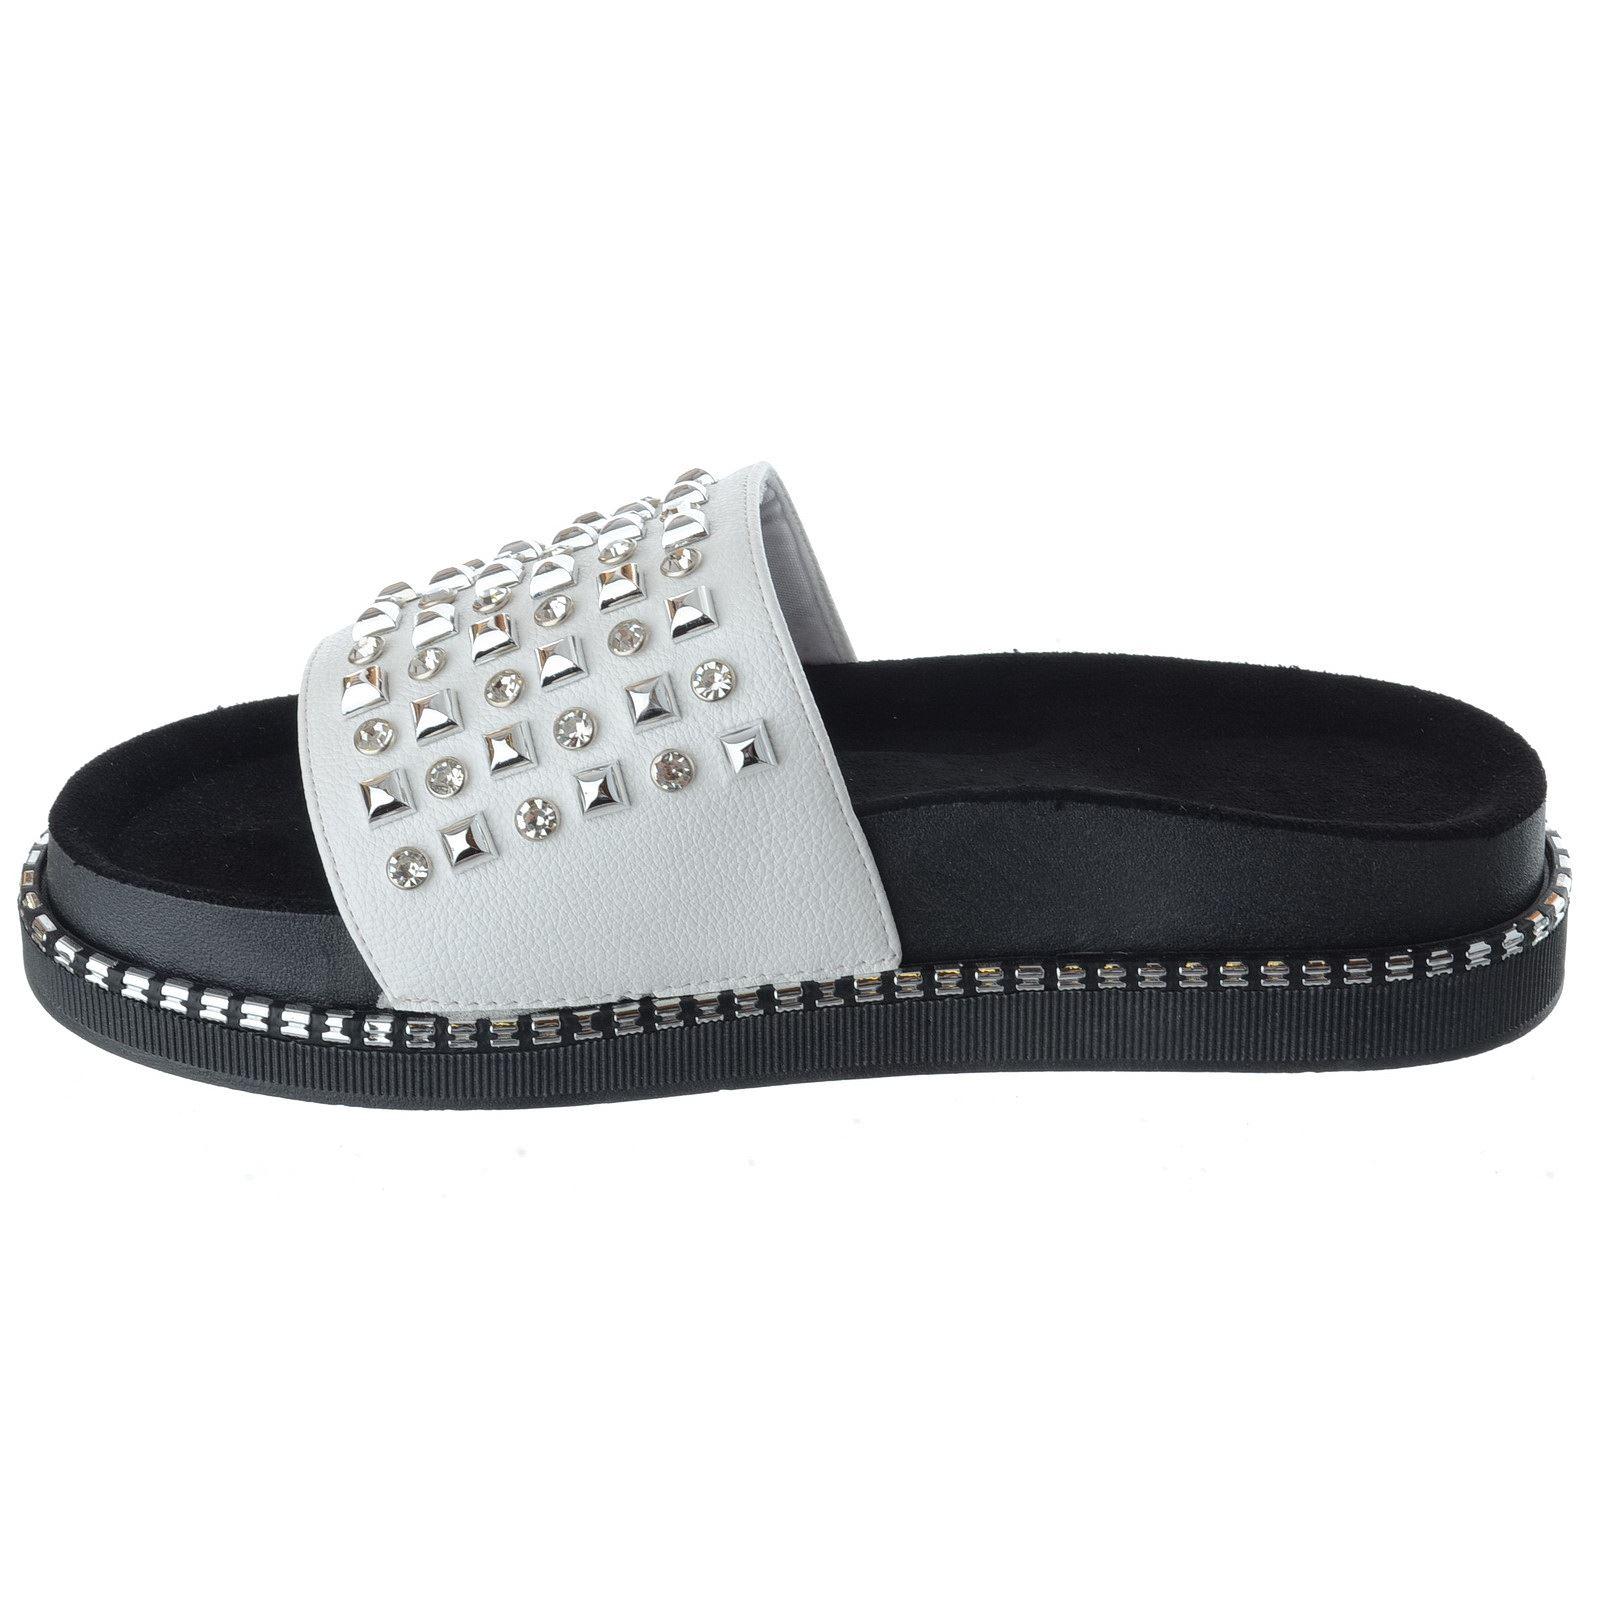 Ladies Womens Flat Low Heel Slip On Diamante Sliders Flatform Sandals Shoes Size